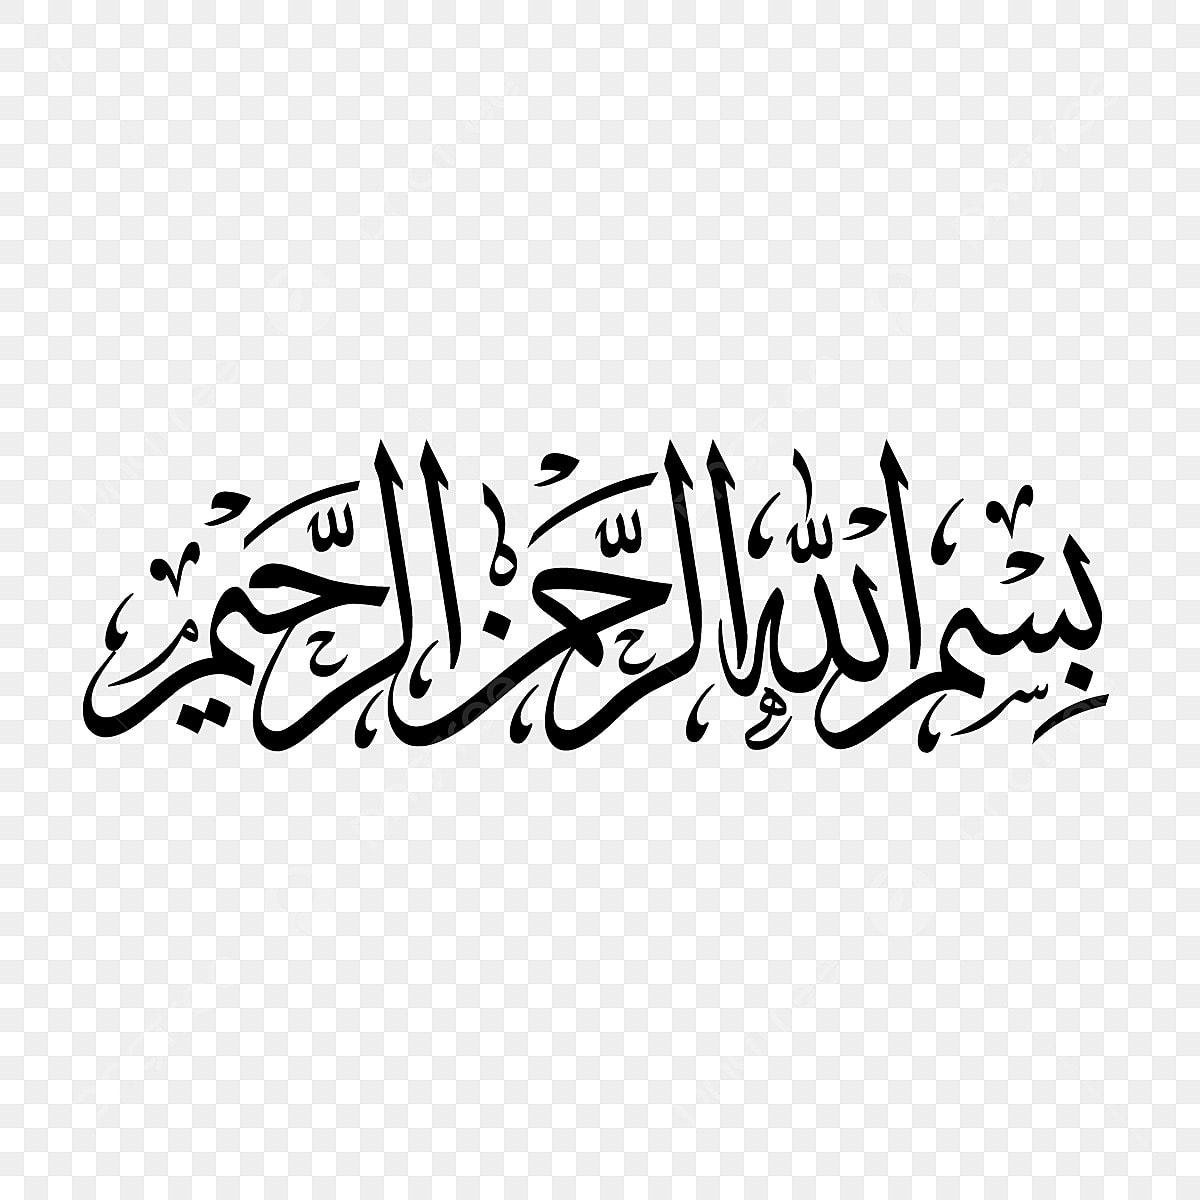 Bismillah Calligraphy Bw, Bismillah, Calligraphy ...  Bismillah Calligraphy Clipart